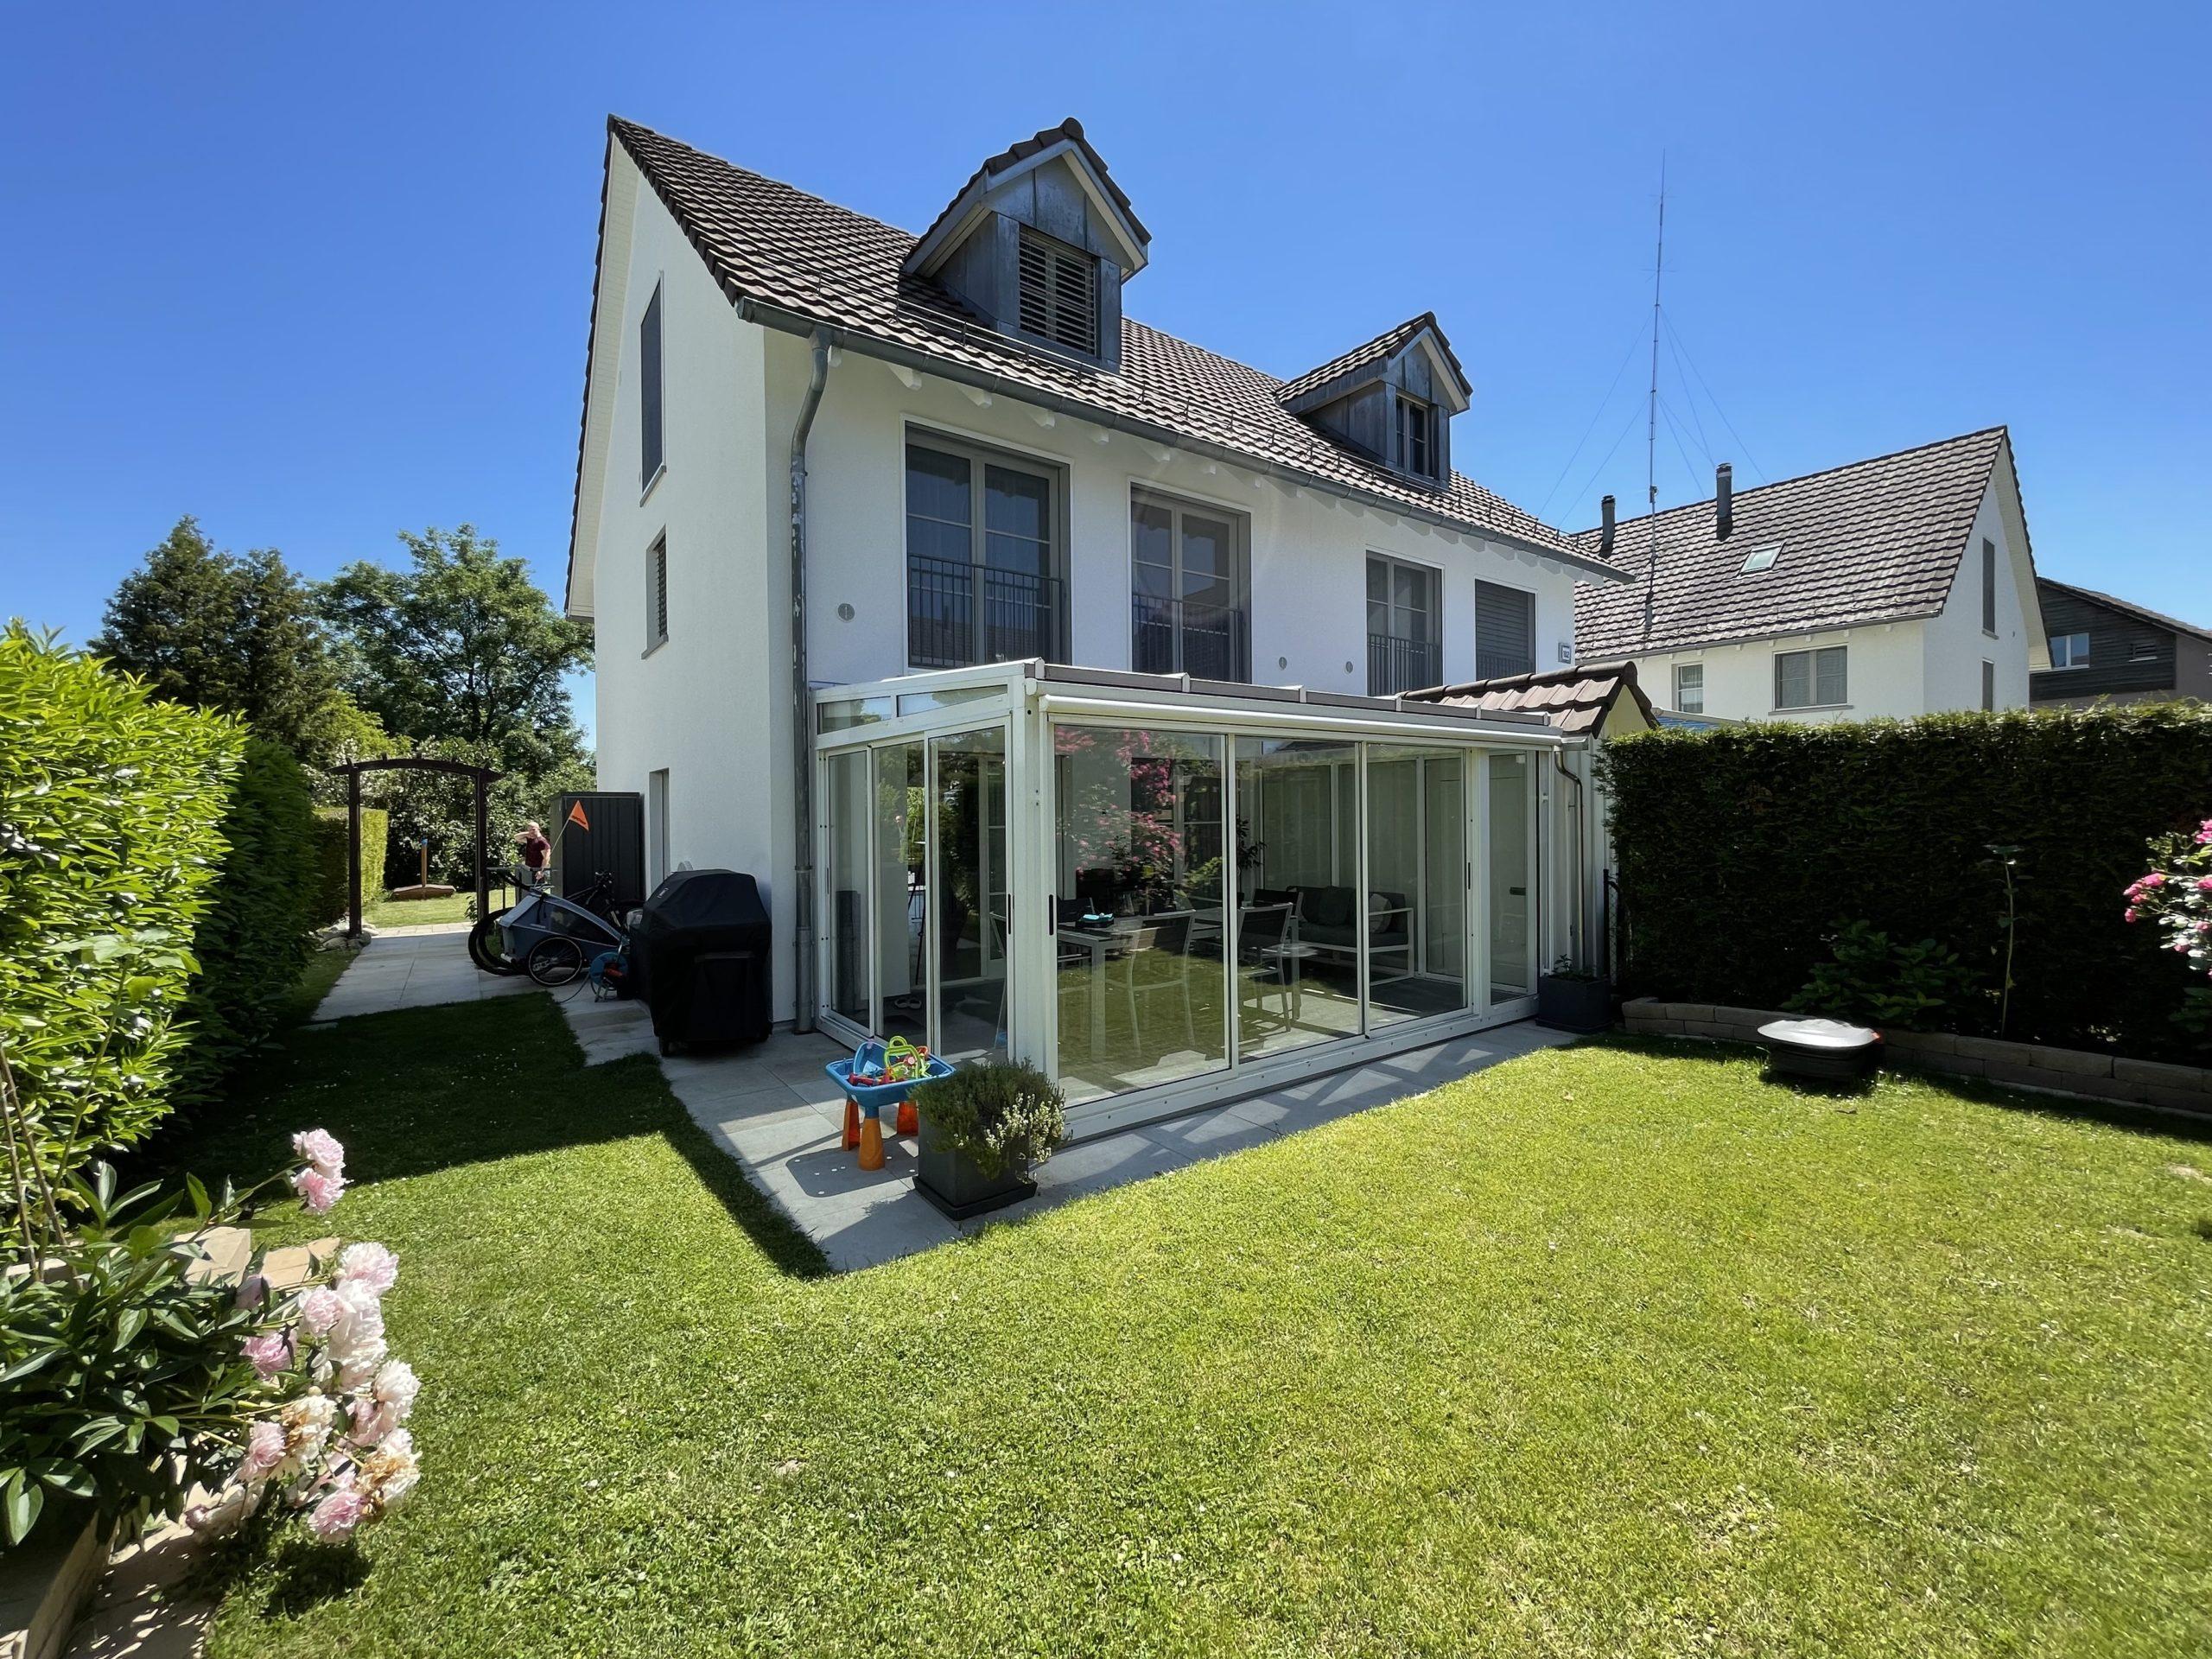 Doppelhaushälfte im Grünen und doch Stadt-nah – Zürich Oberglatt